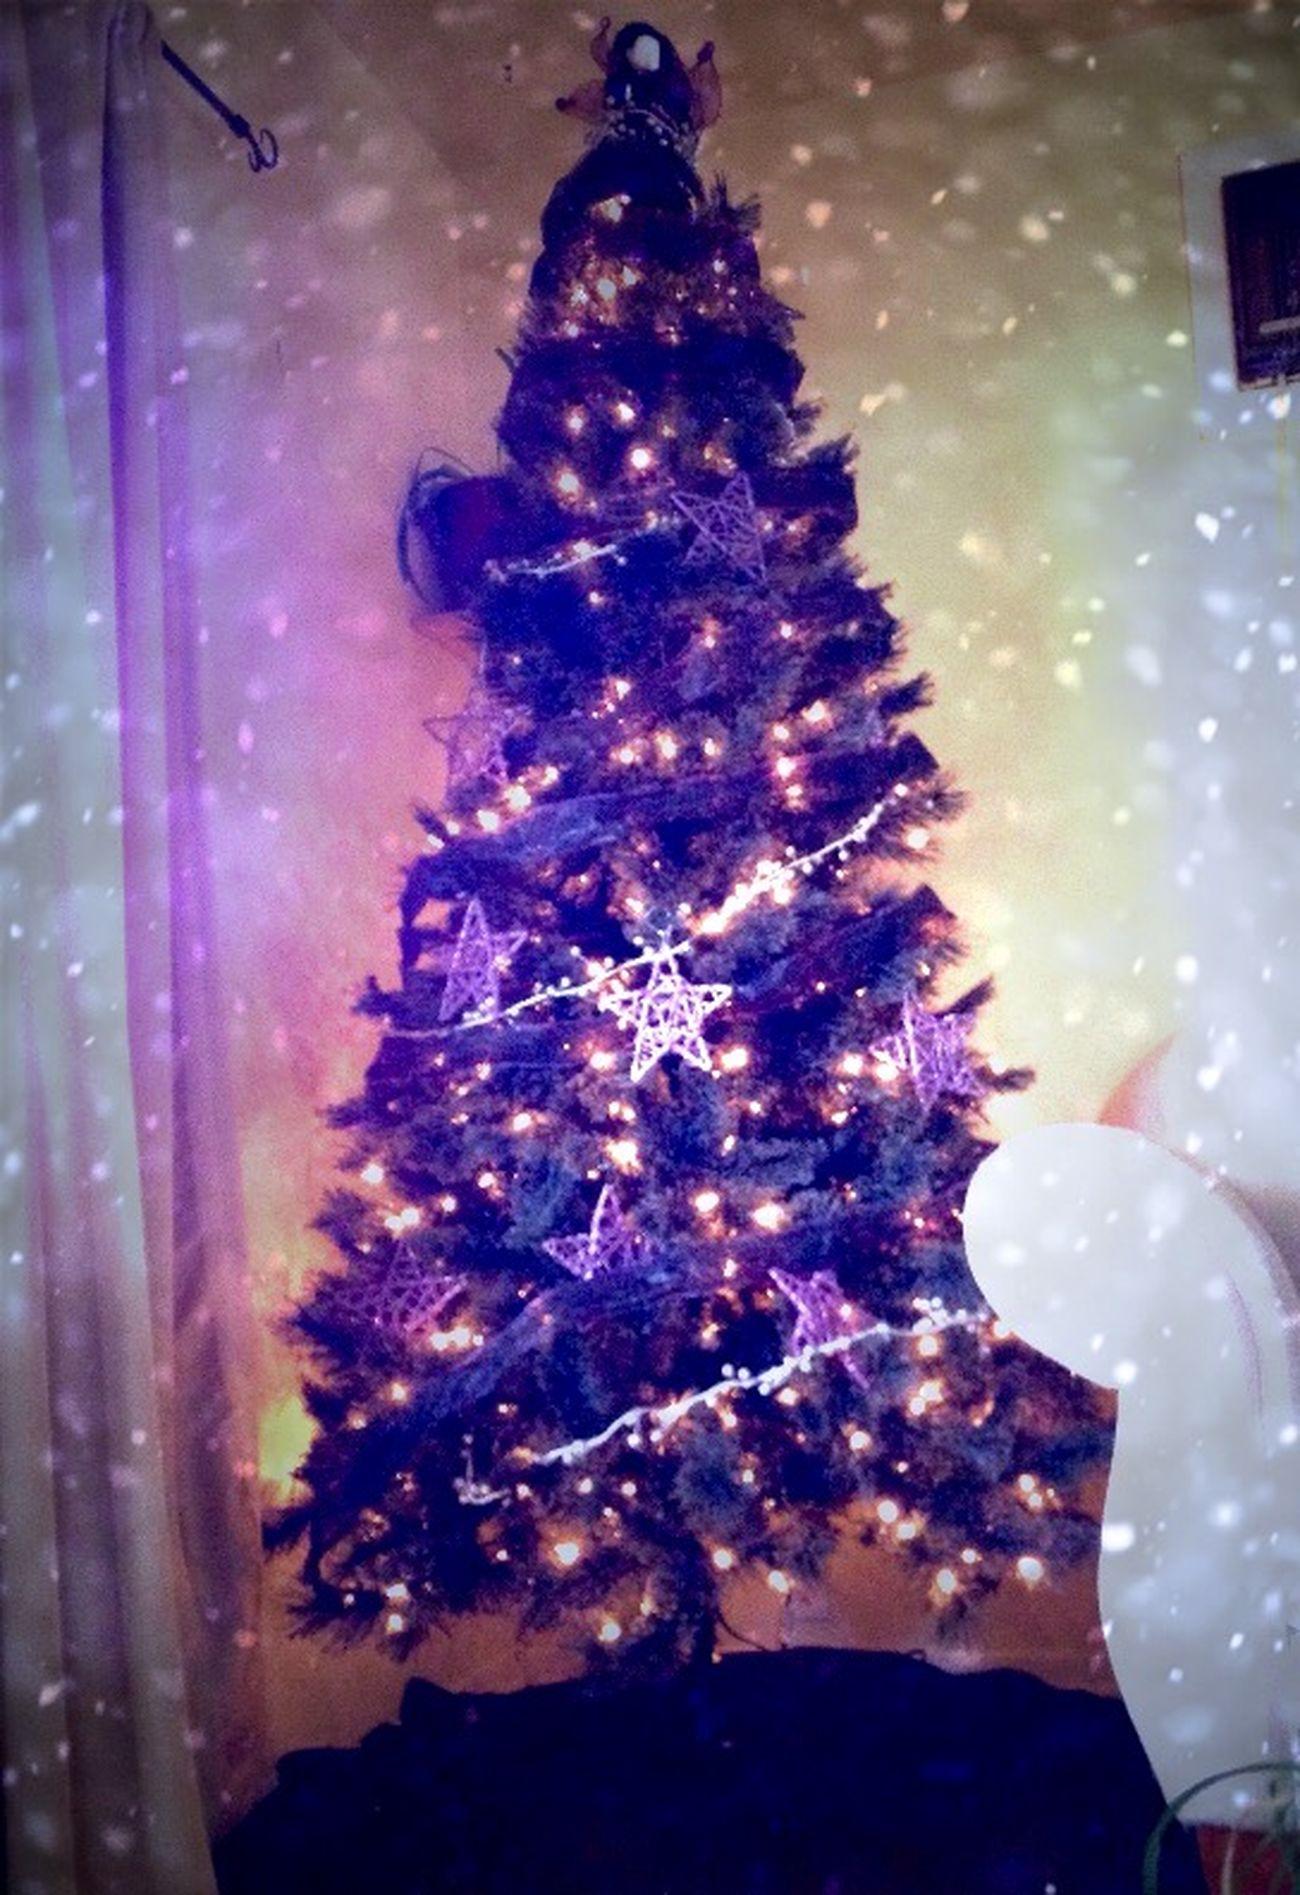 My Xmas Tree Christmas Winter Home Sweet Home